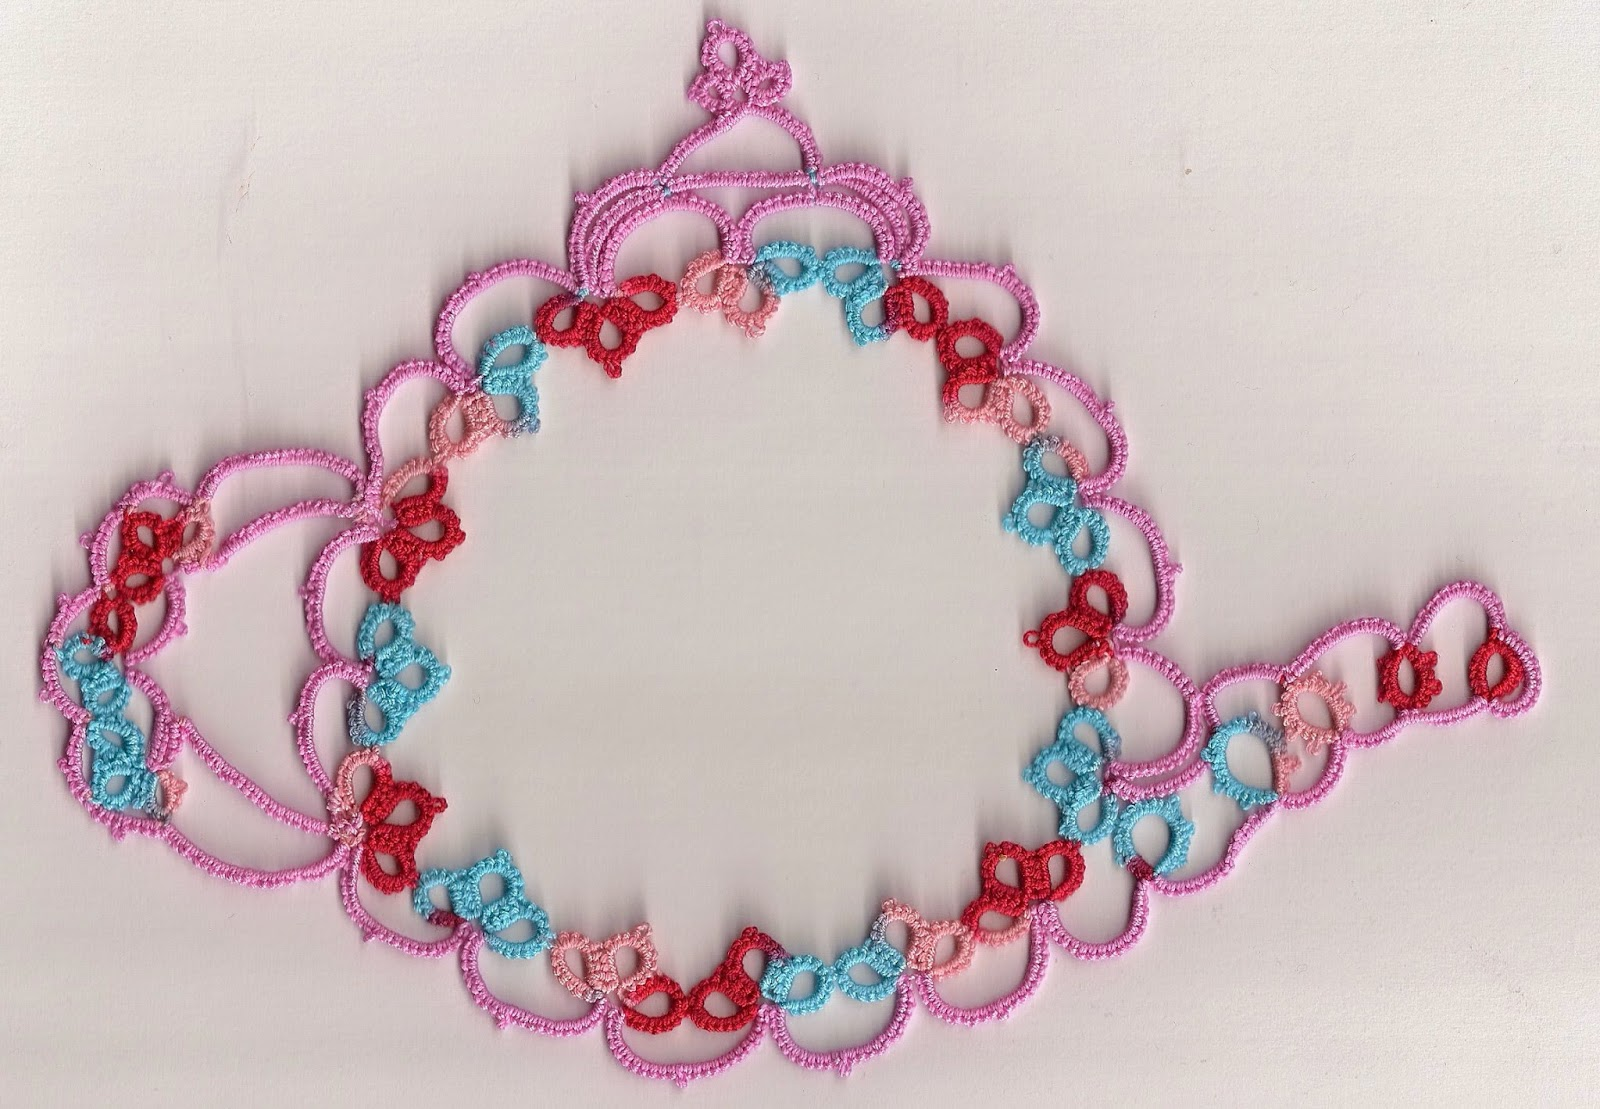 http://2.bp.blogspot.com/-SZ_rxiBfHhk/VRLlhcJ-Q1I/AAAAAAAAFEw/rQmZUpHHN_Y/s1600/teapotoutline.jpg